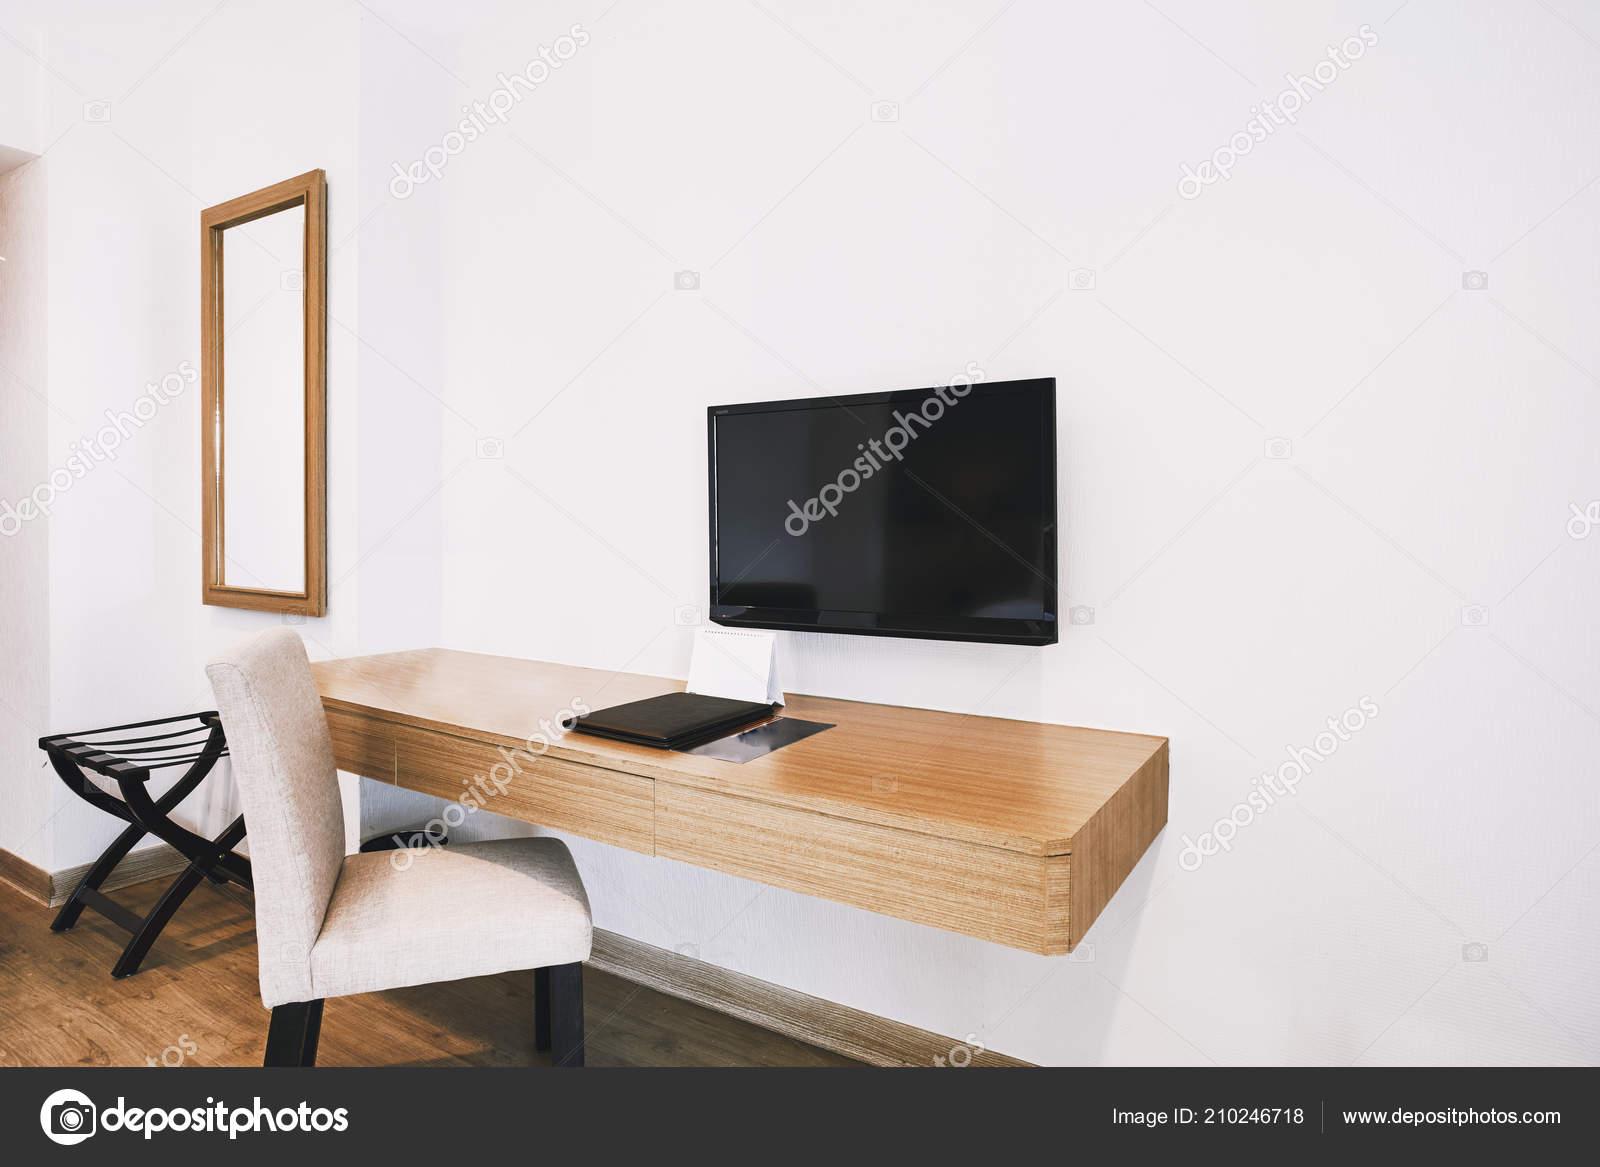 Moderne hotel appartement kamer decoratie met hulpprogramma bureau